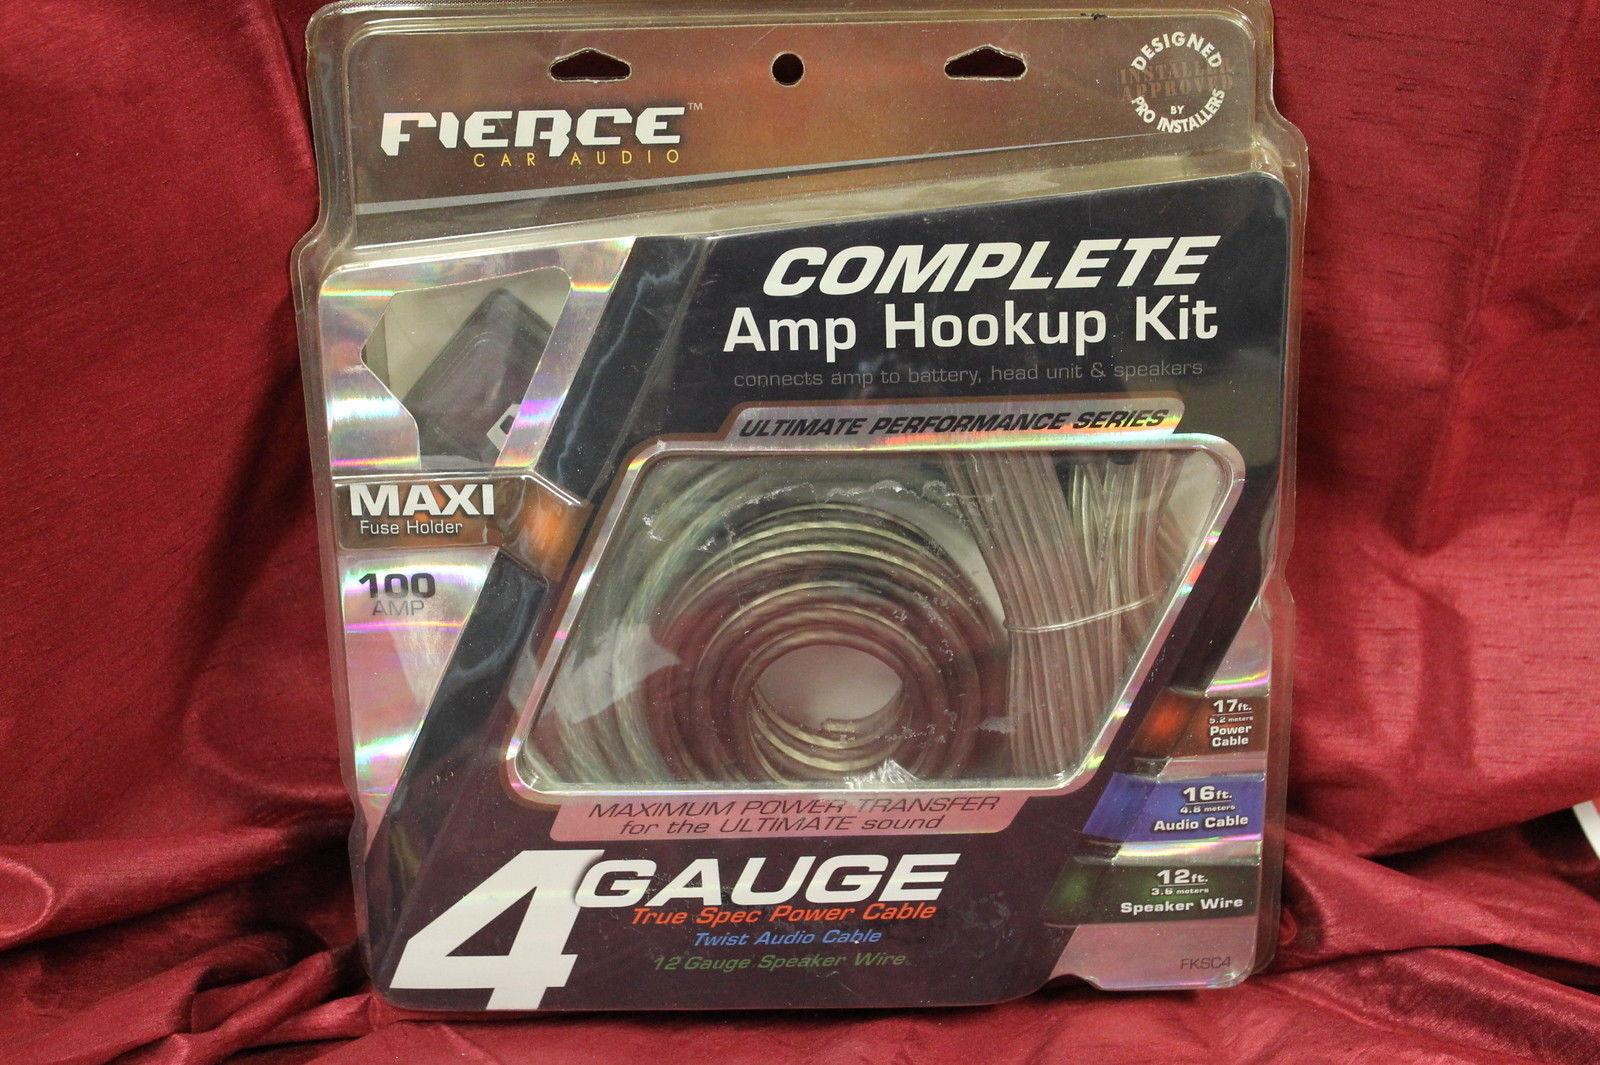 Fierce Fksc4 4 Gauge Amp Install Kit 4awg And 50 Similar Items Bullz Audio 8 Car Amplifier Installation Power Wiring S L1600